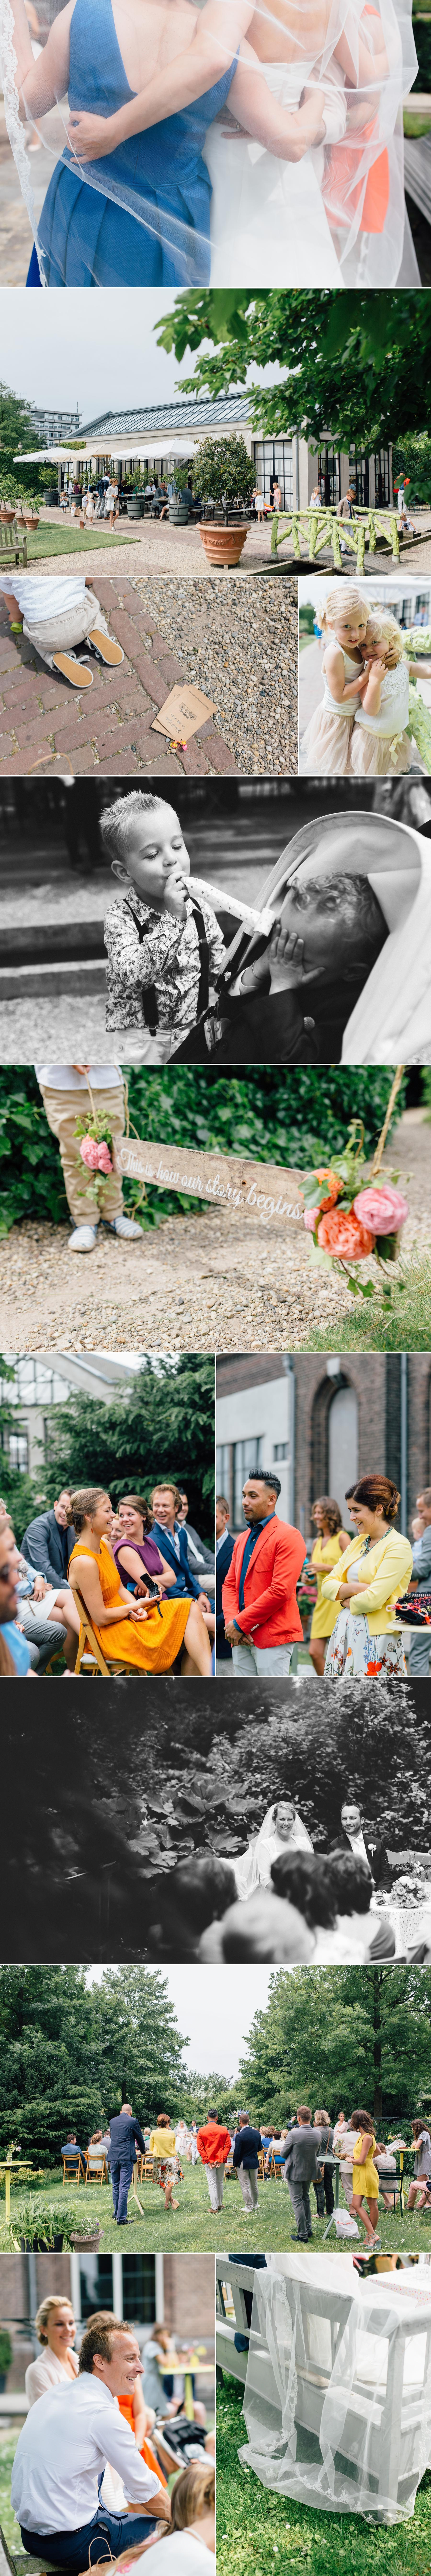 Villa augustus, bruidsfotograaf